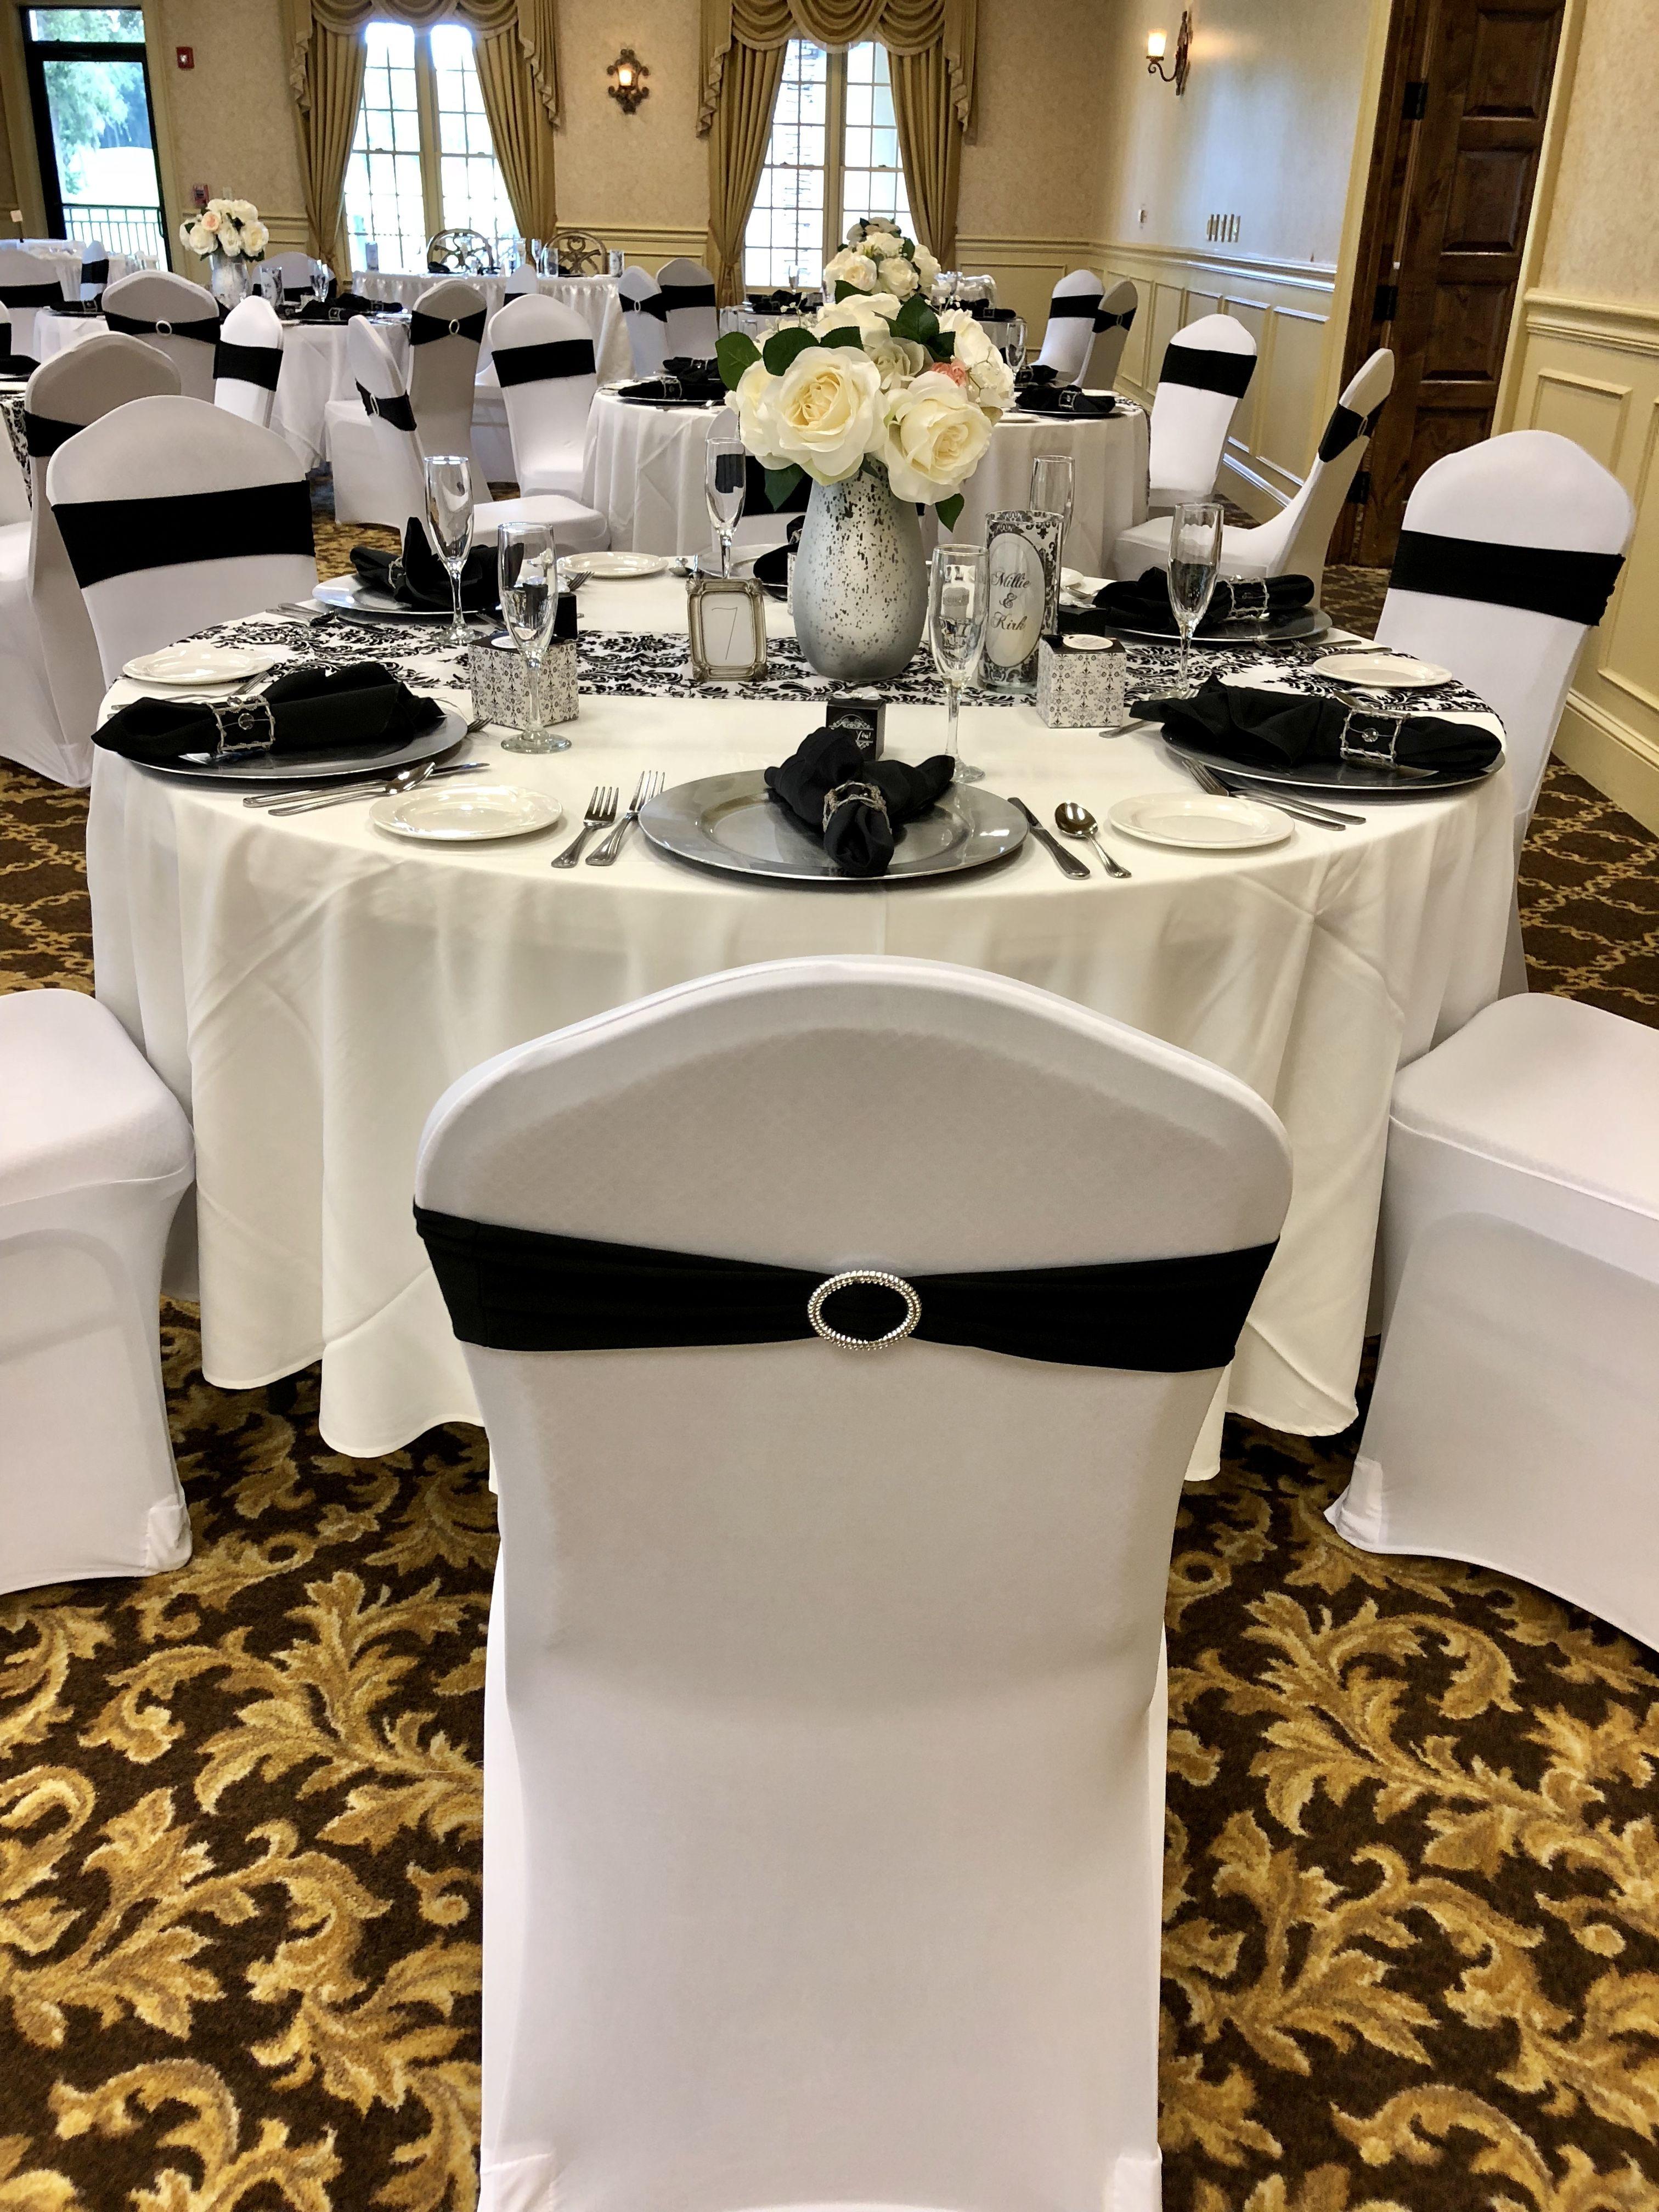 Black White Damask Runner With White Tablecloths White Spandex